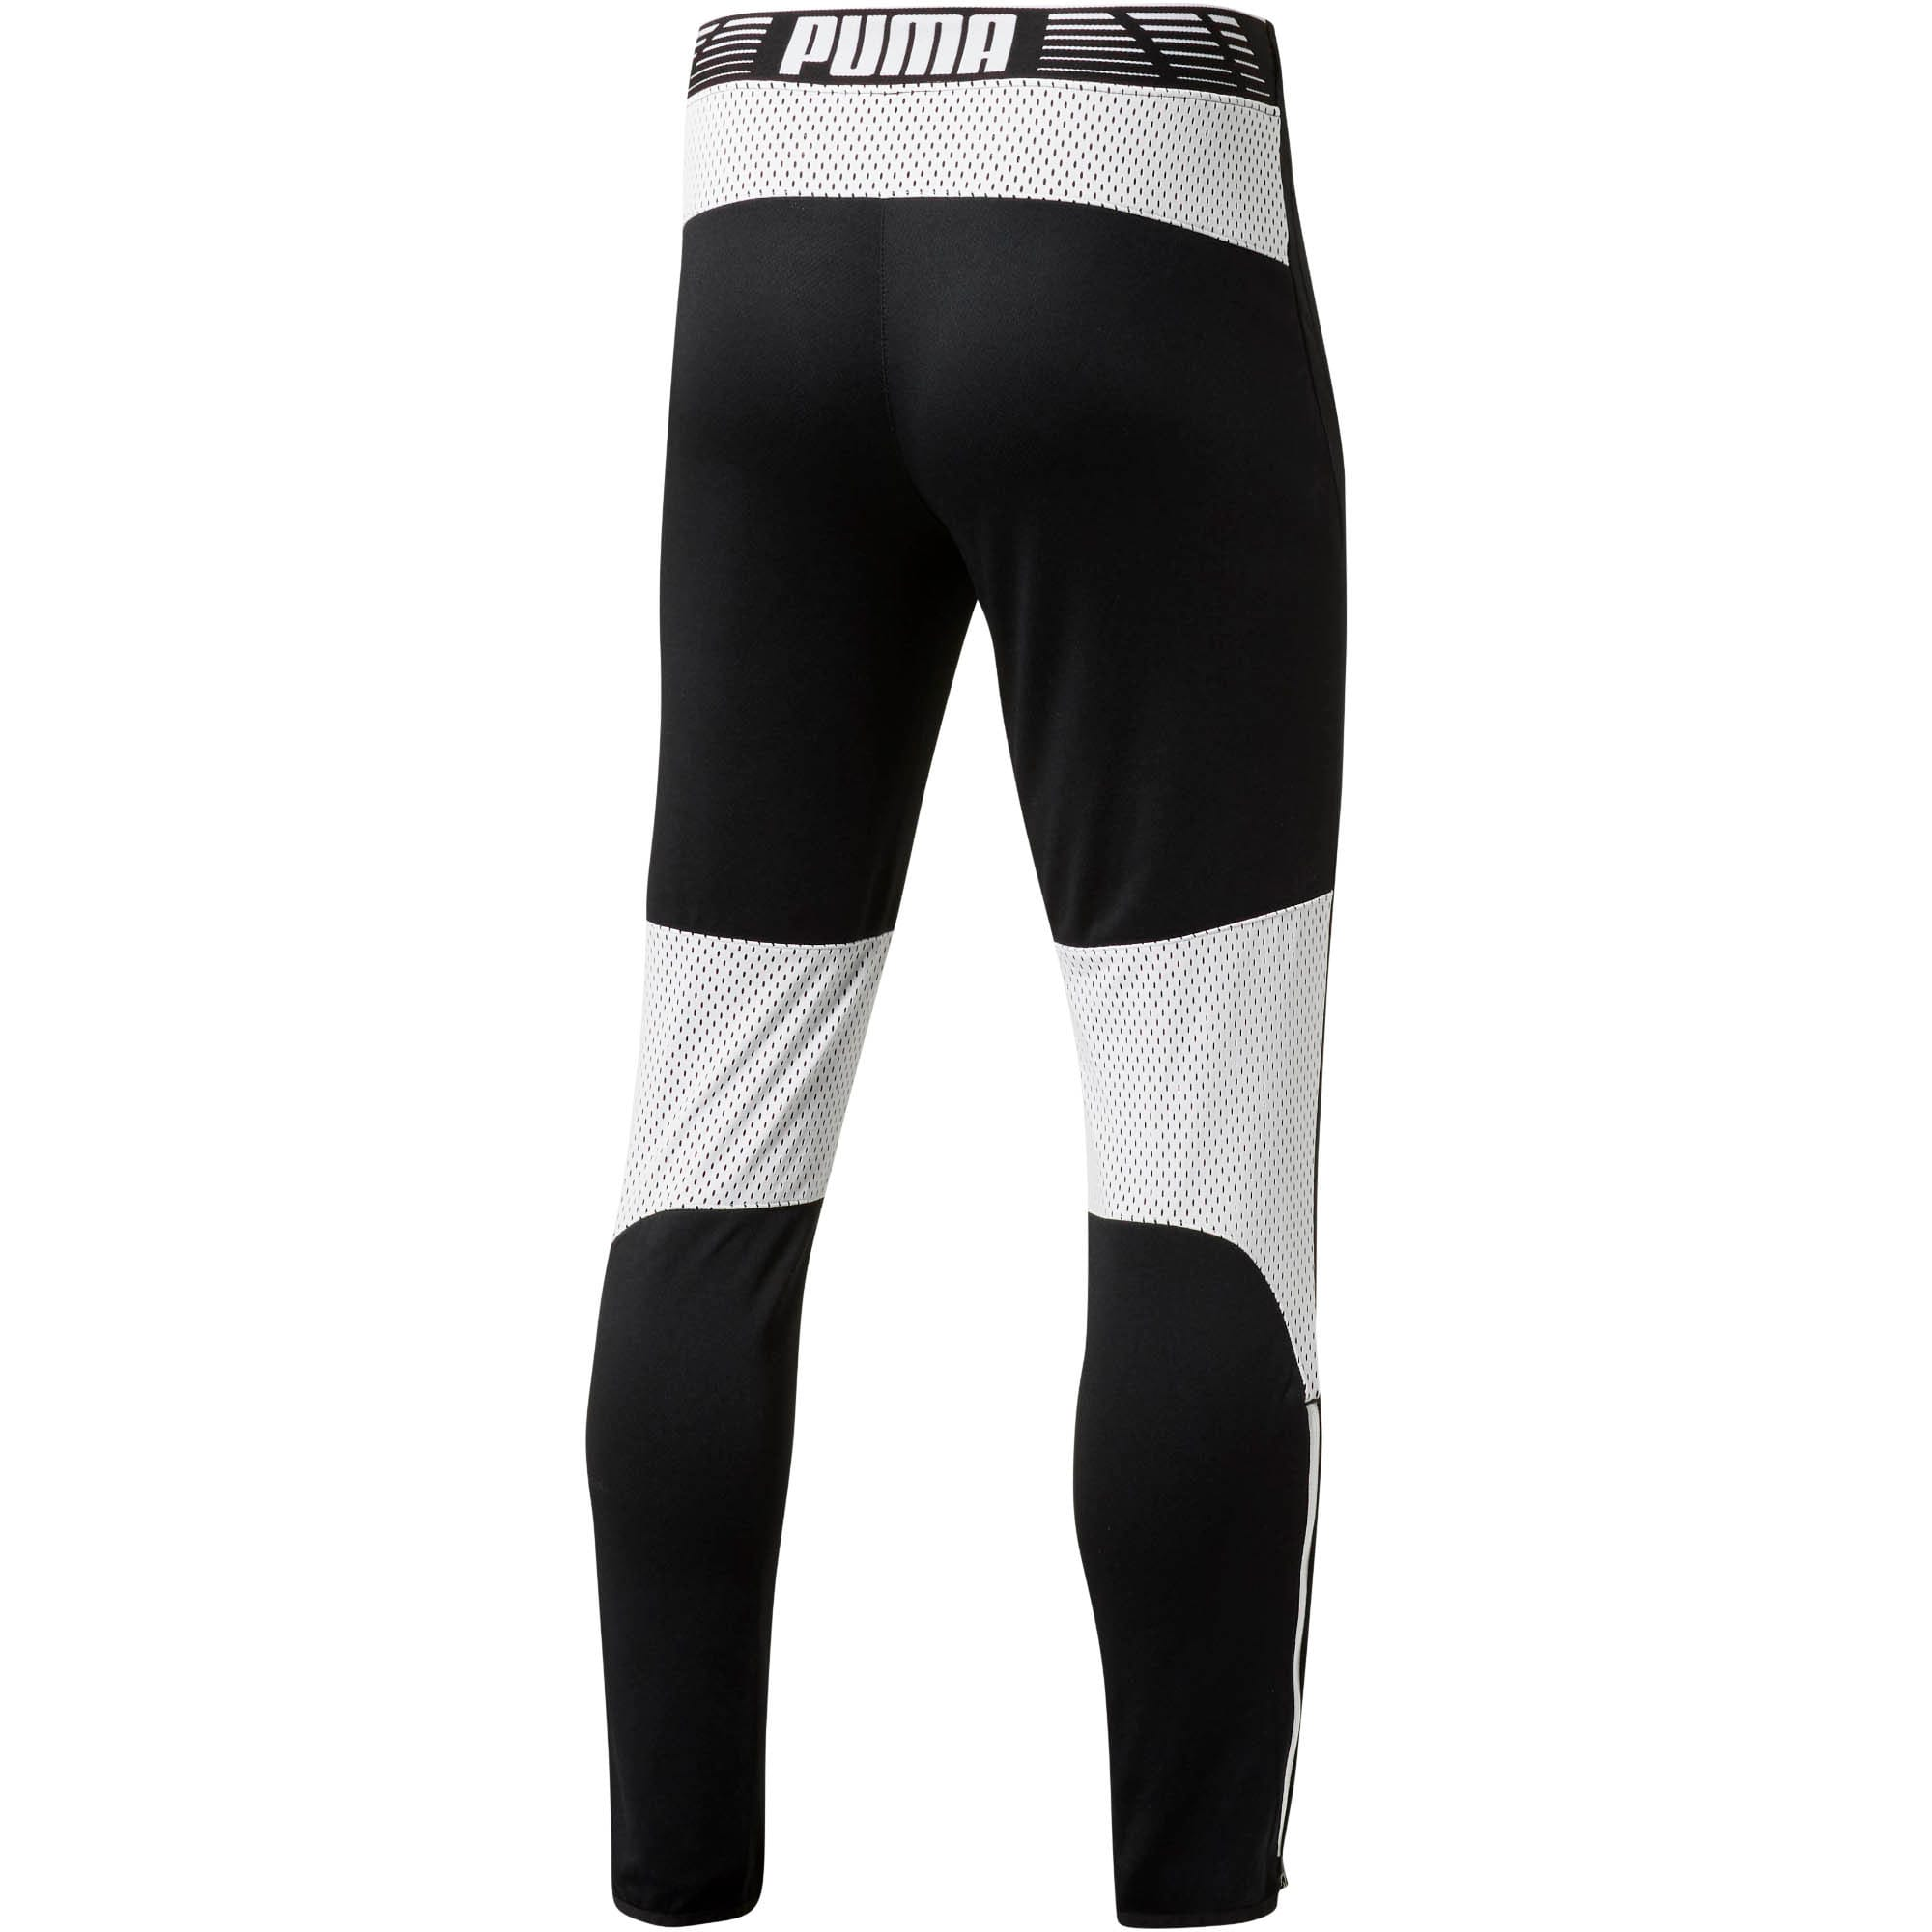 Thumbnail 3 of Flicker Tech Track Pants, Puma Black-White, medium